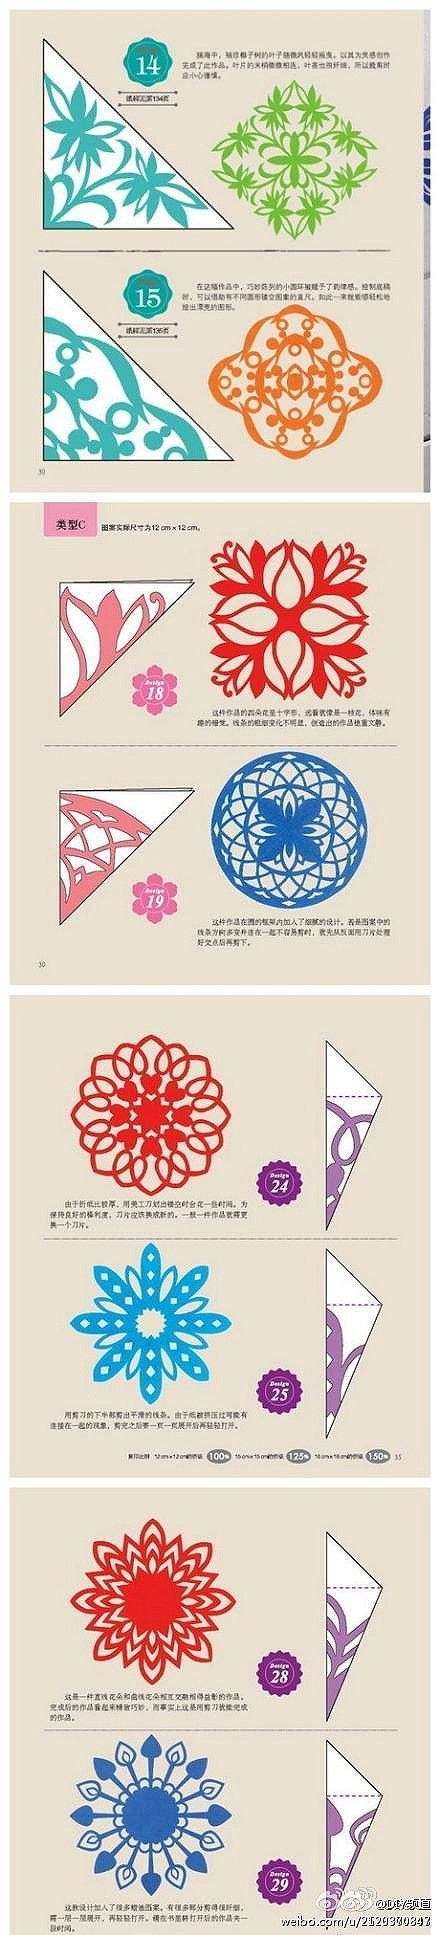 Hawaiian quilt patterns | Kirigami | Pinterest | Arte del origami ...